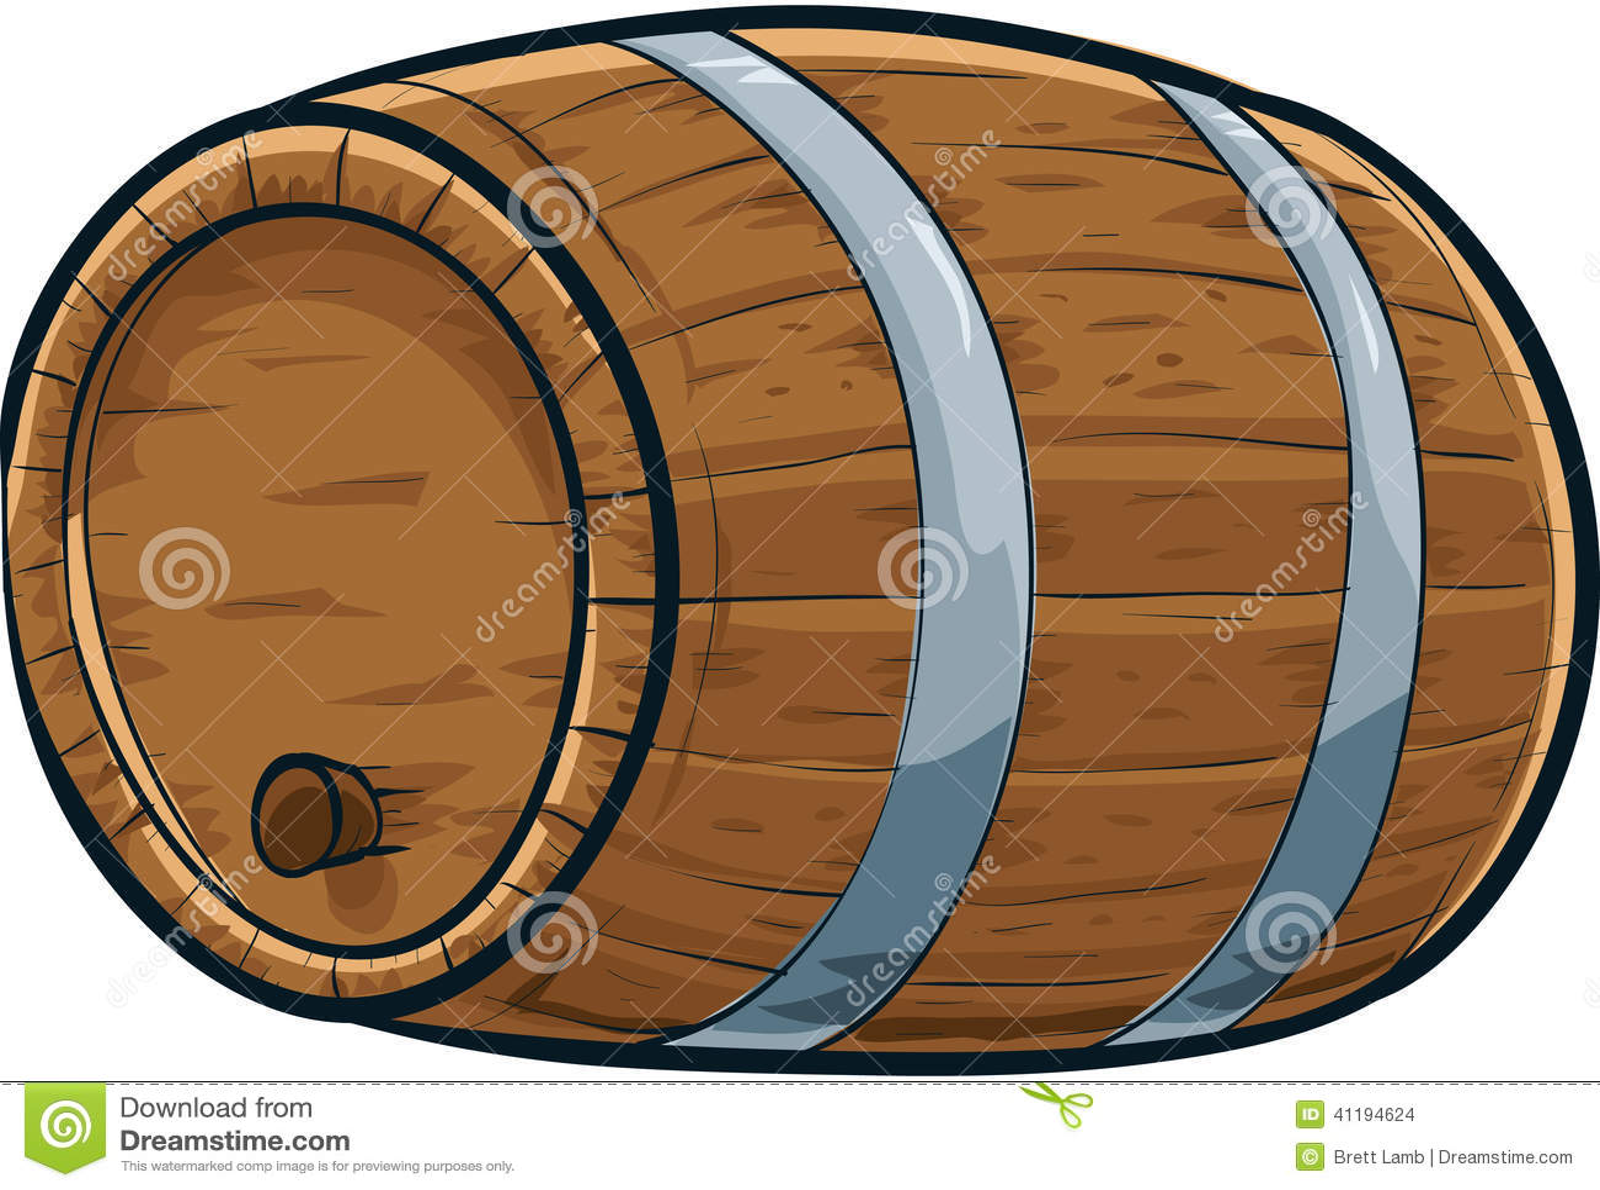 Cartoon Barrel Stock Illustration - Image: 41194624